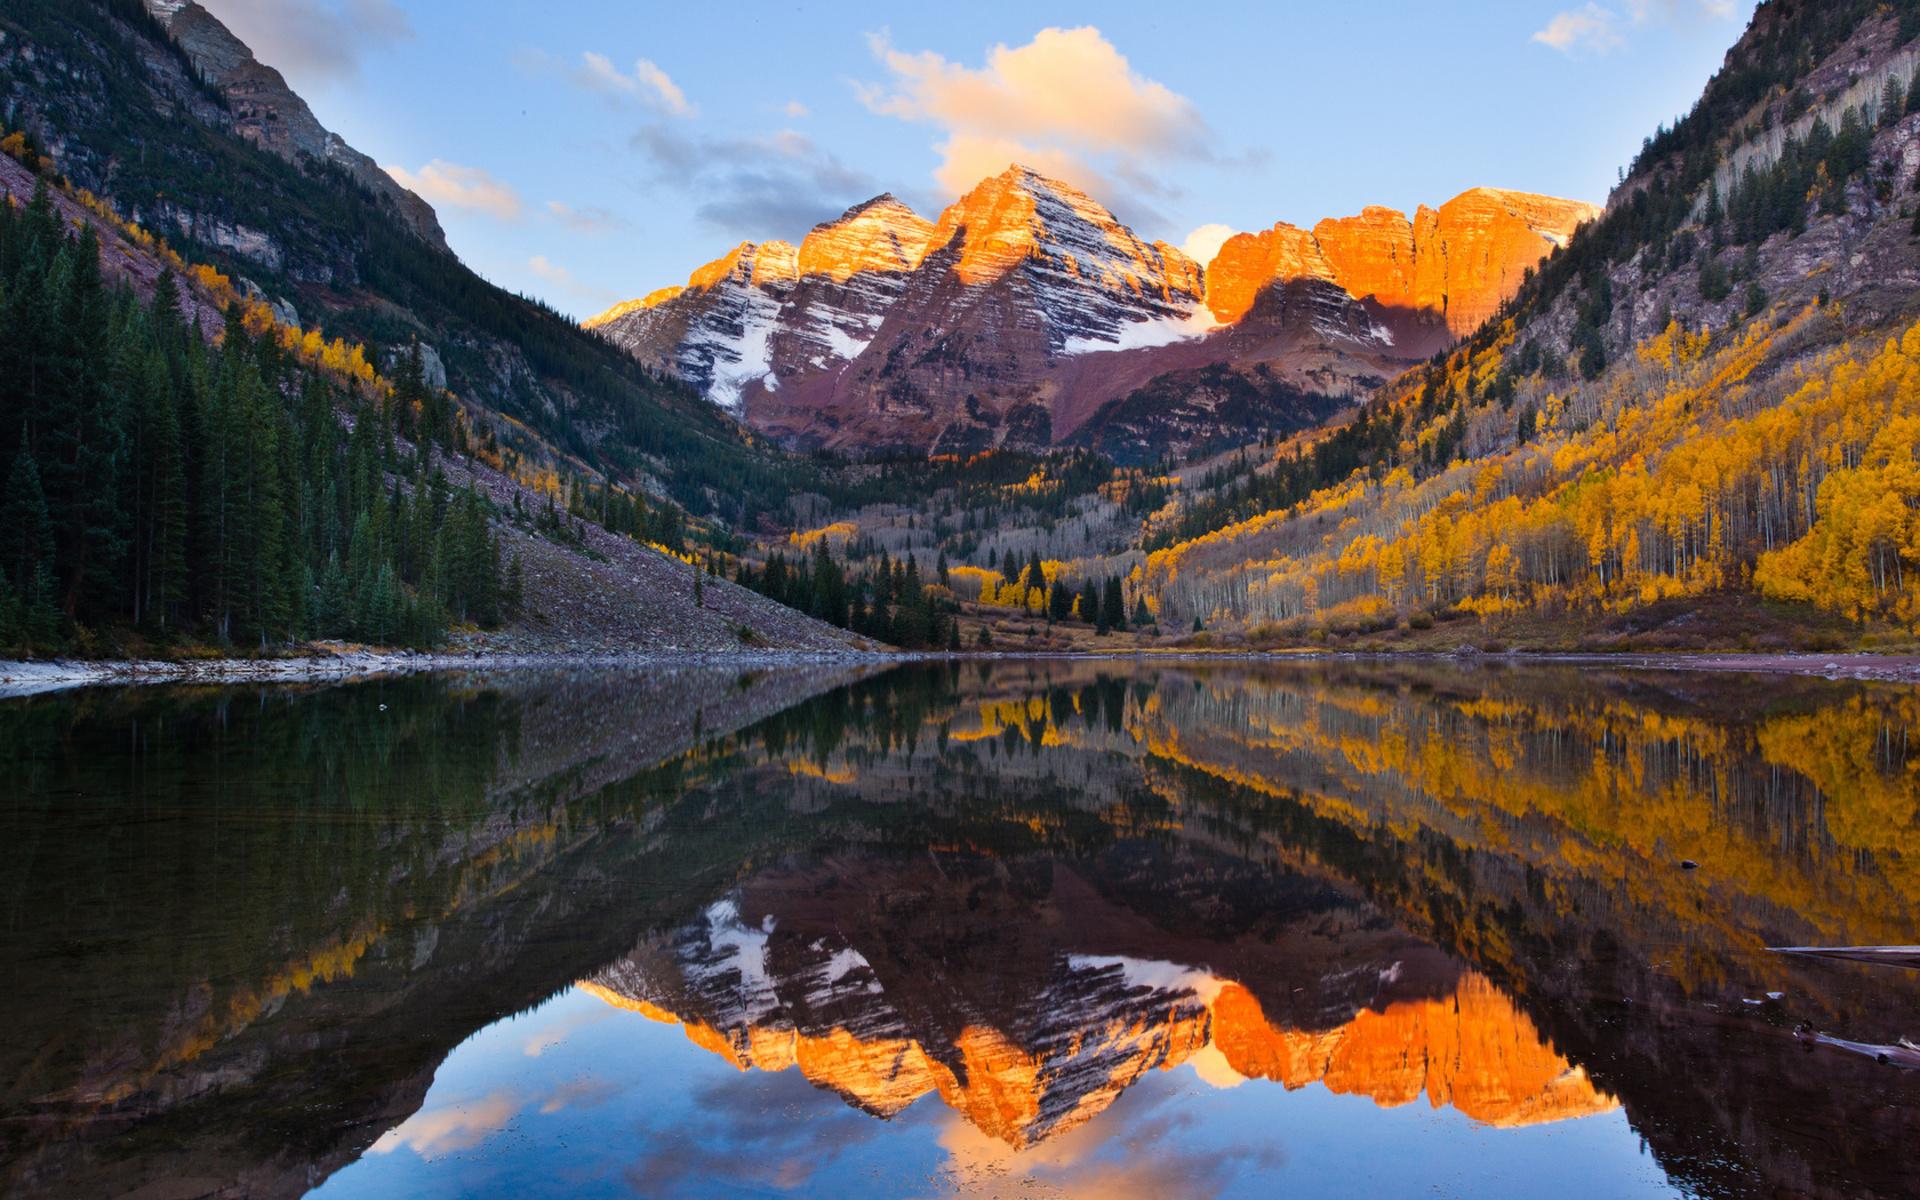 Bing Wallpaper Fall Mirror Reflection By Yogi Arora Desktop Wallpaper